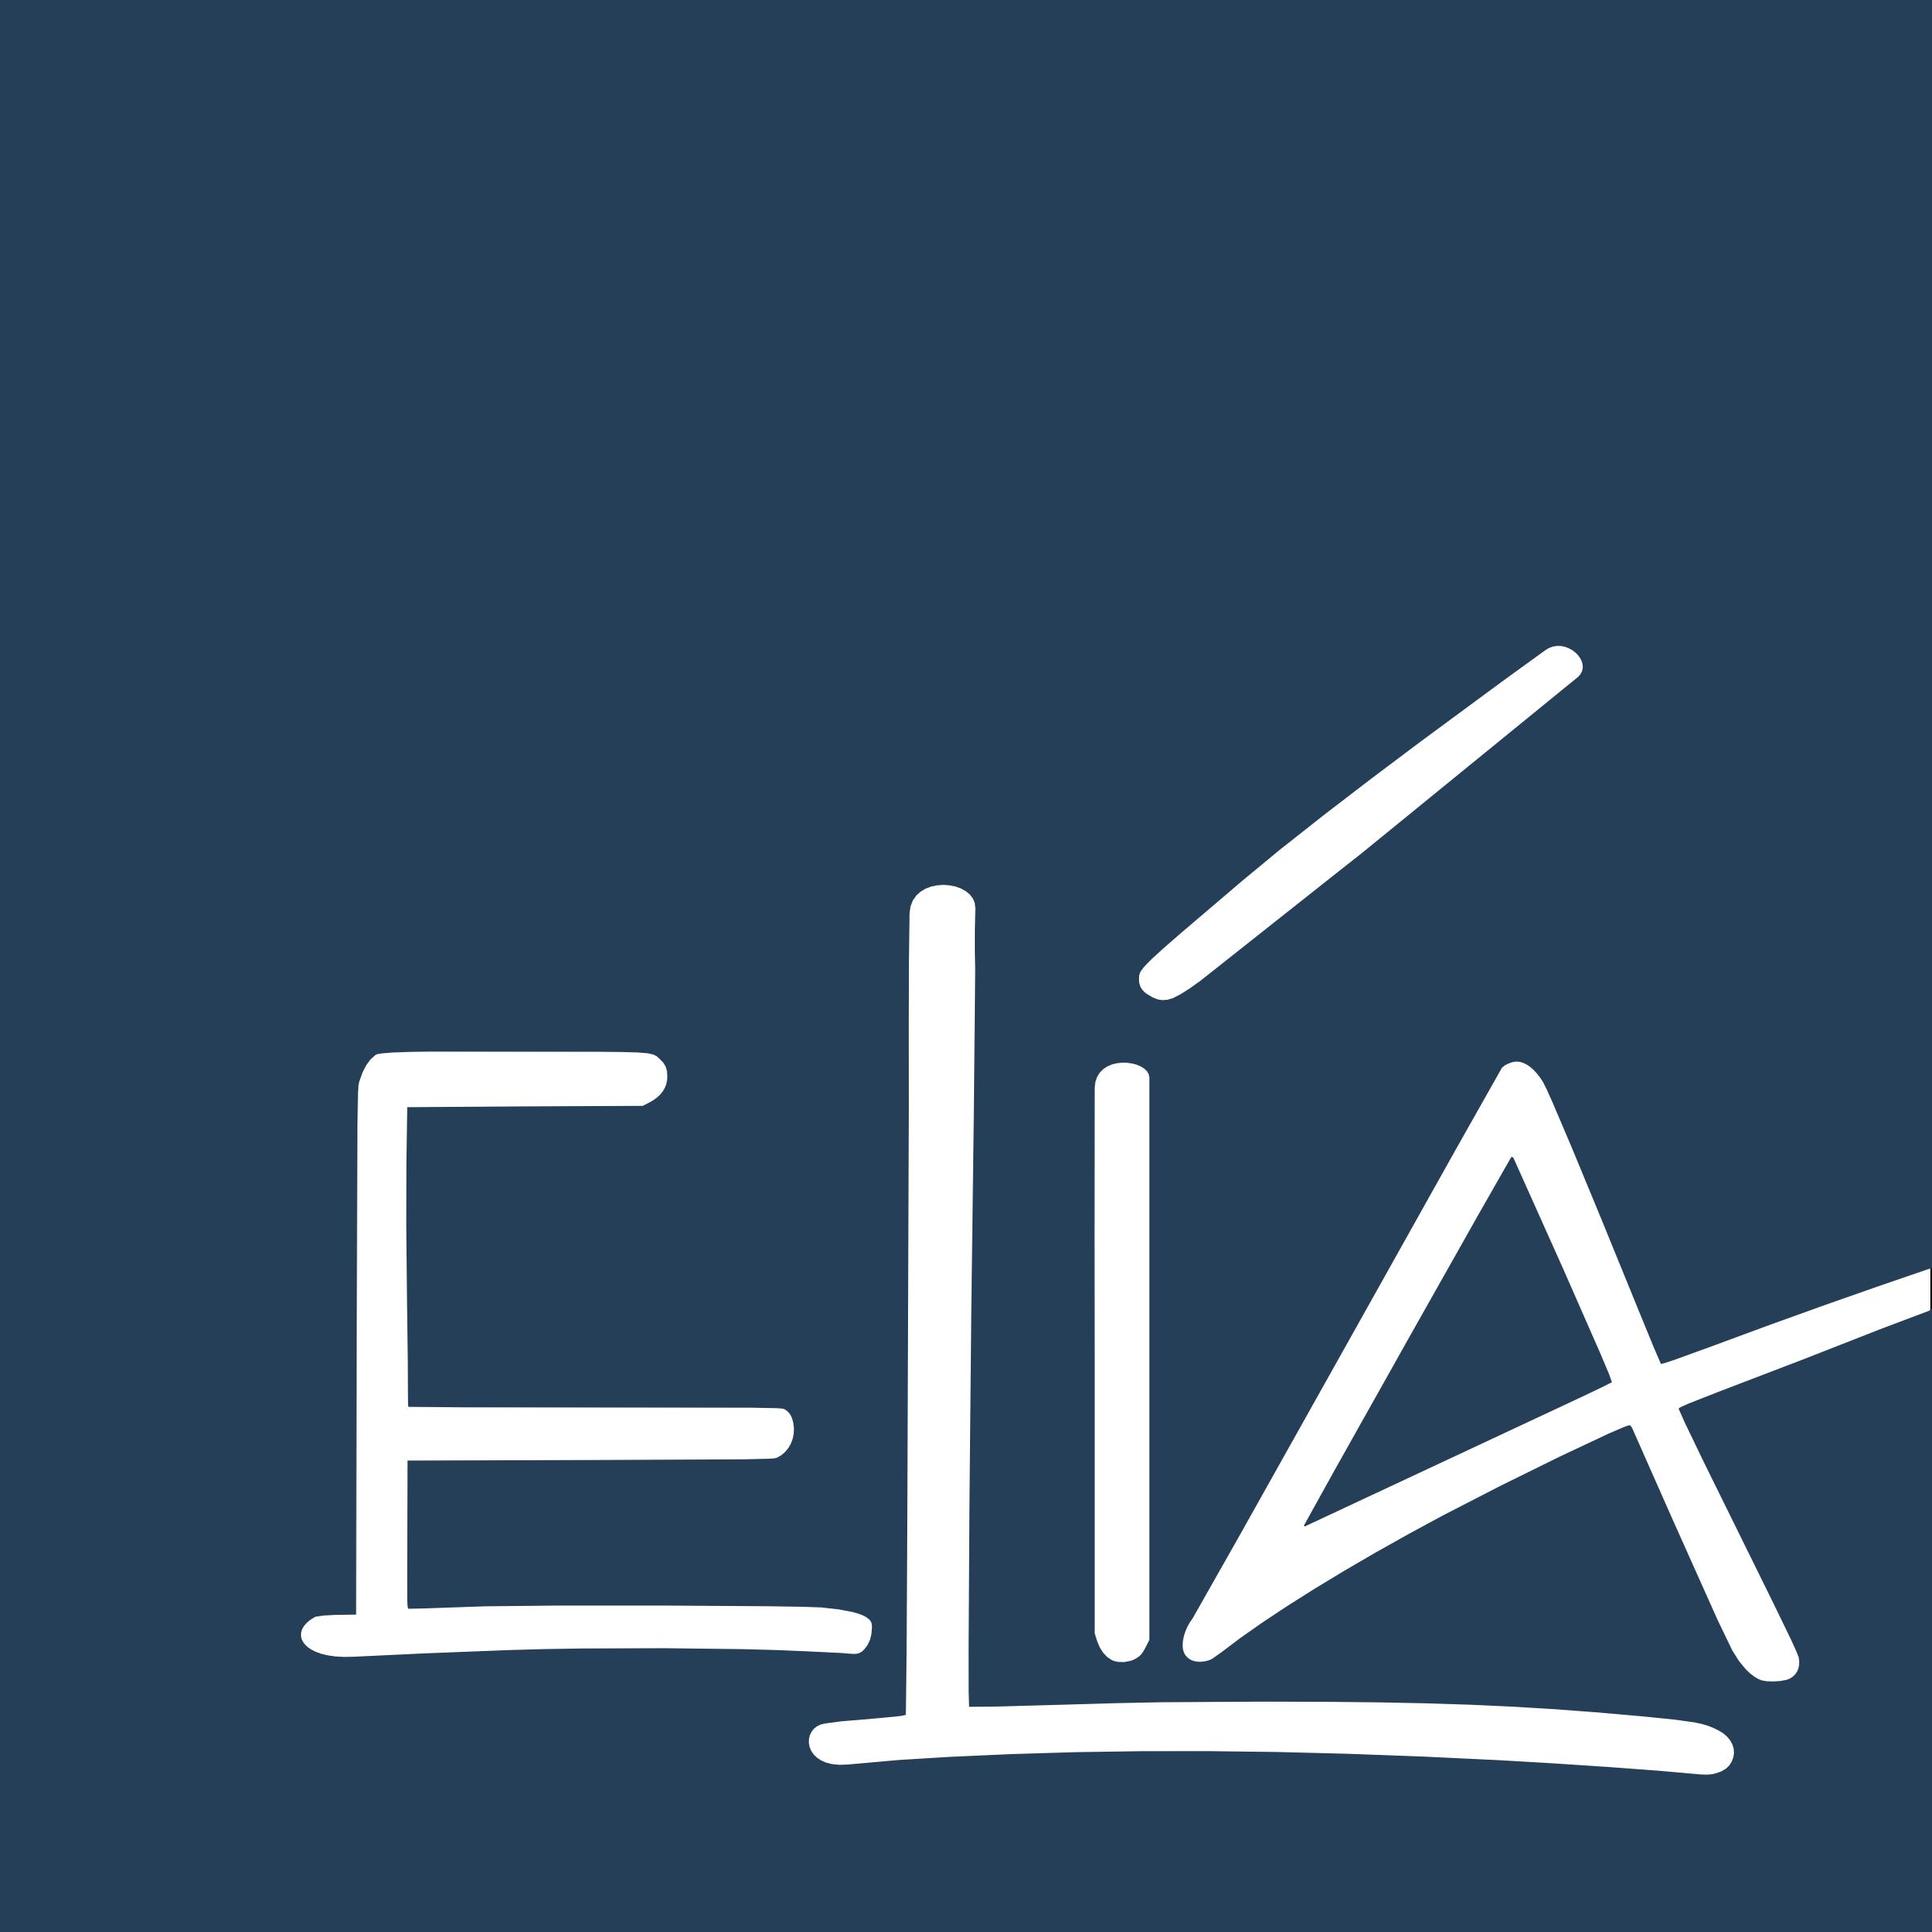 Elia-Gemeinde Erlangen